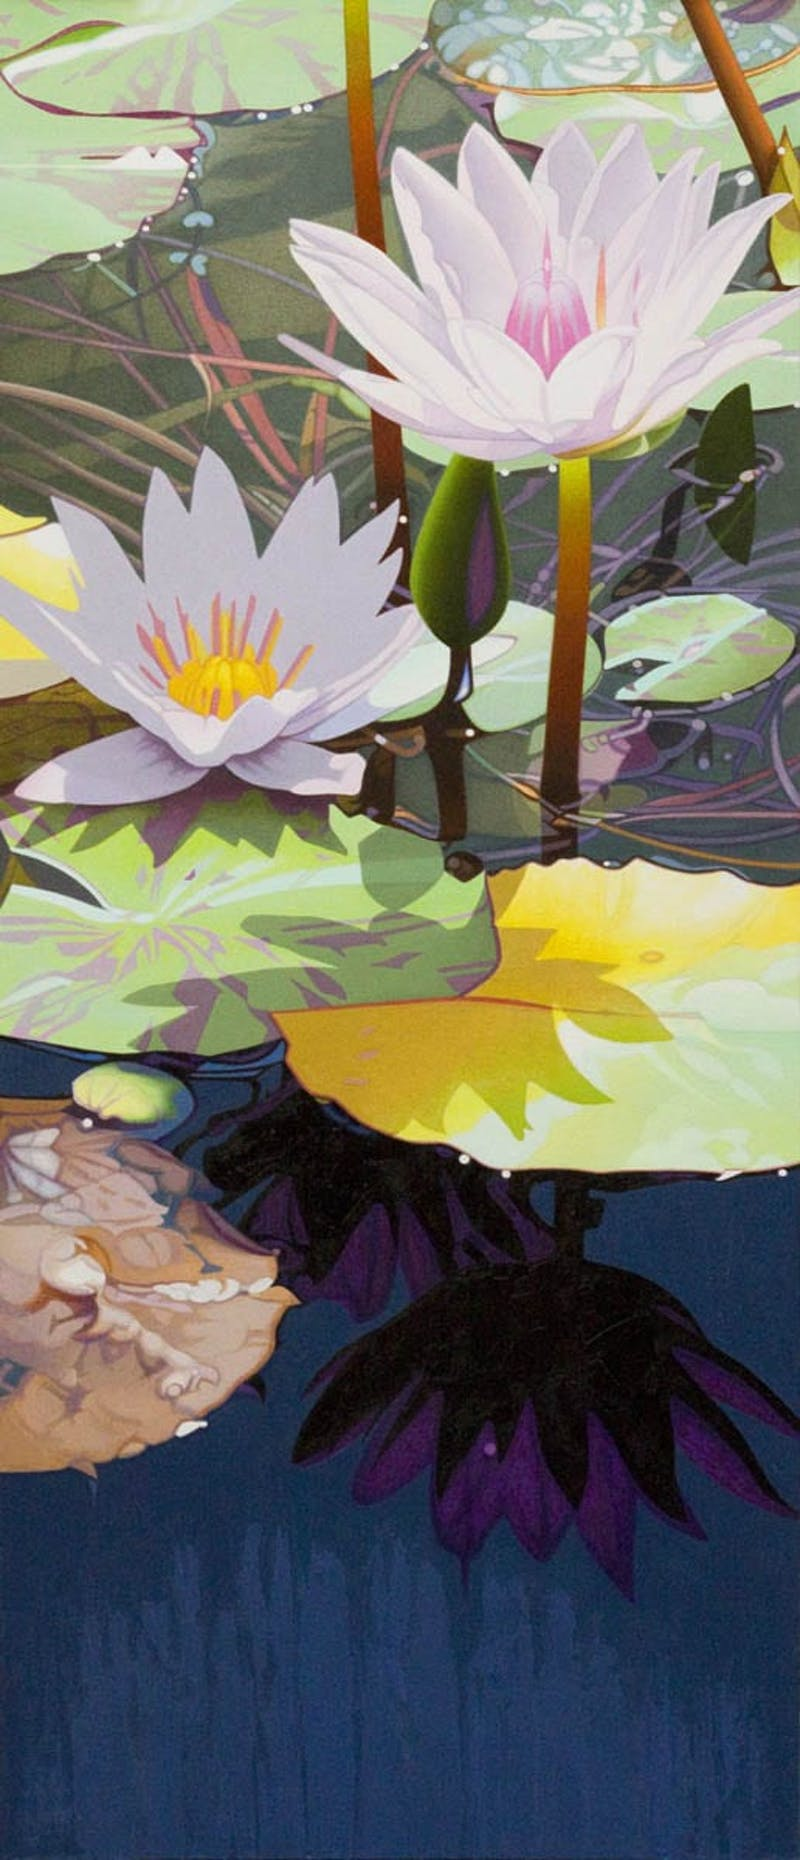 Lily Panel no.3 Image 1